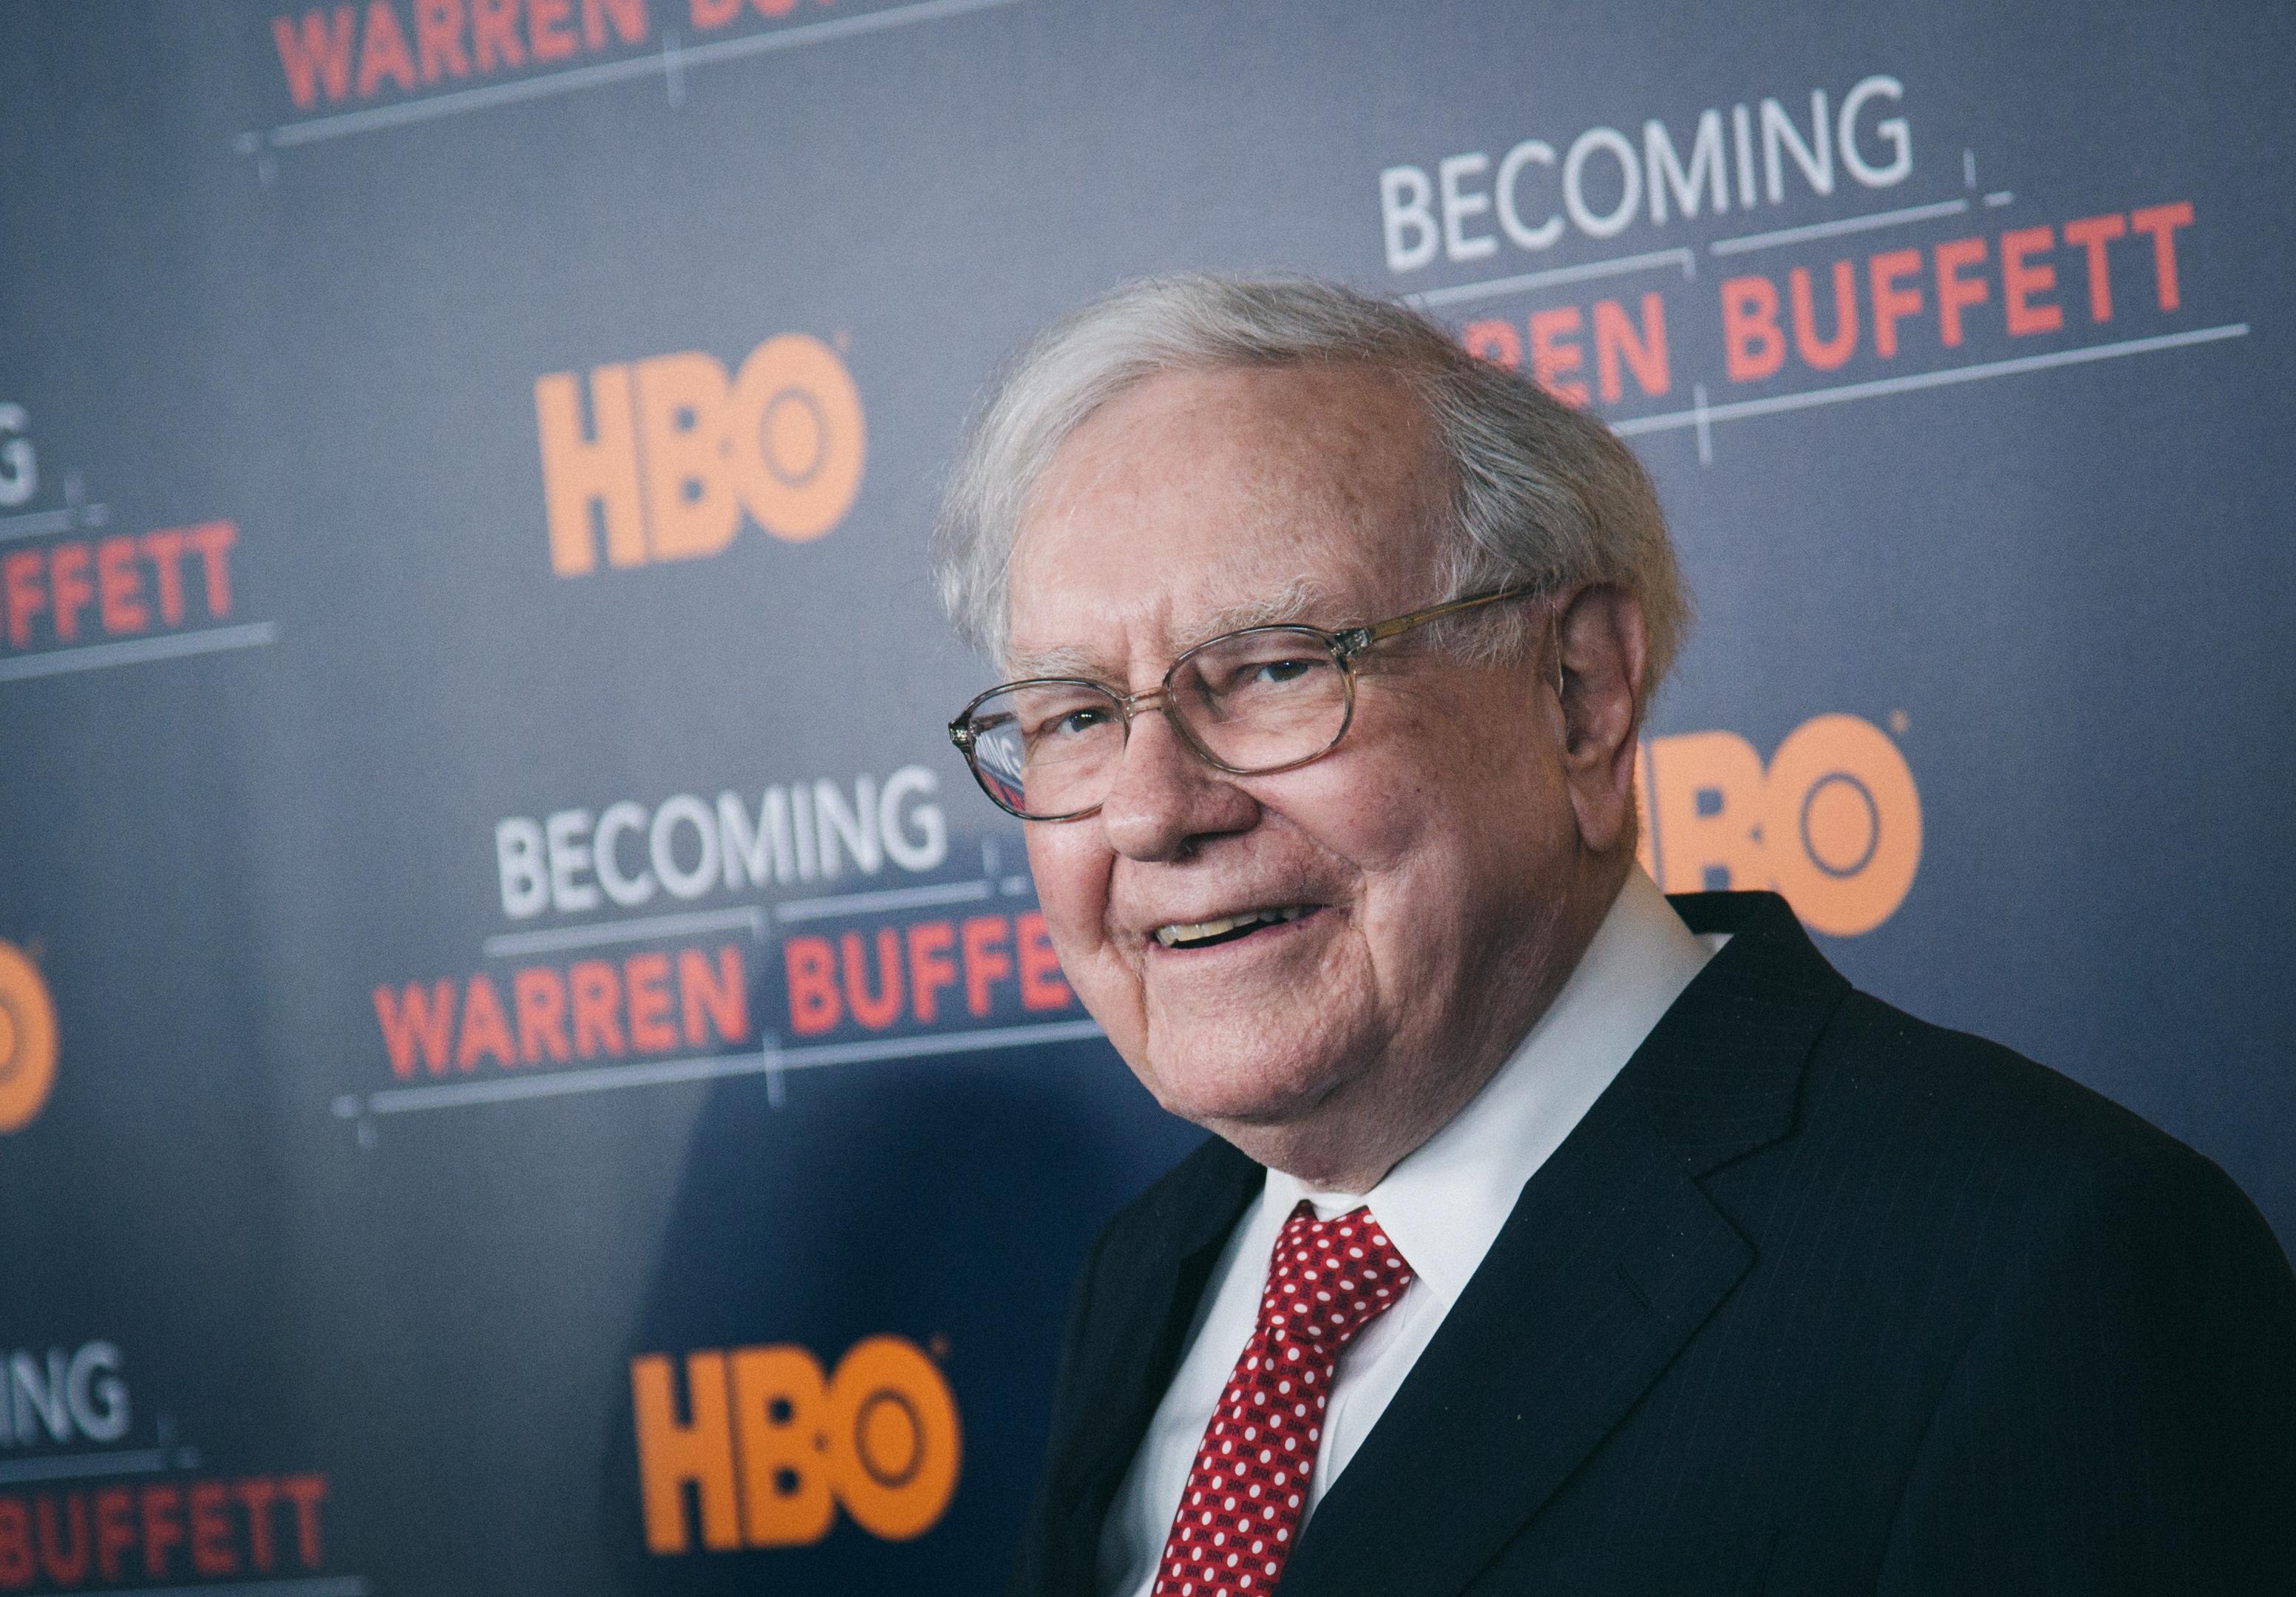 Buffett march madness betting top sport betting sites uk